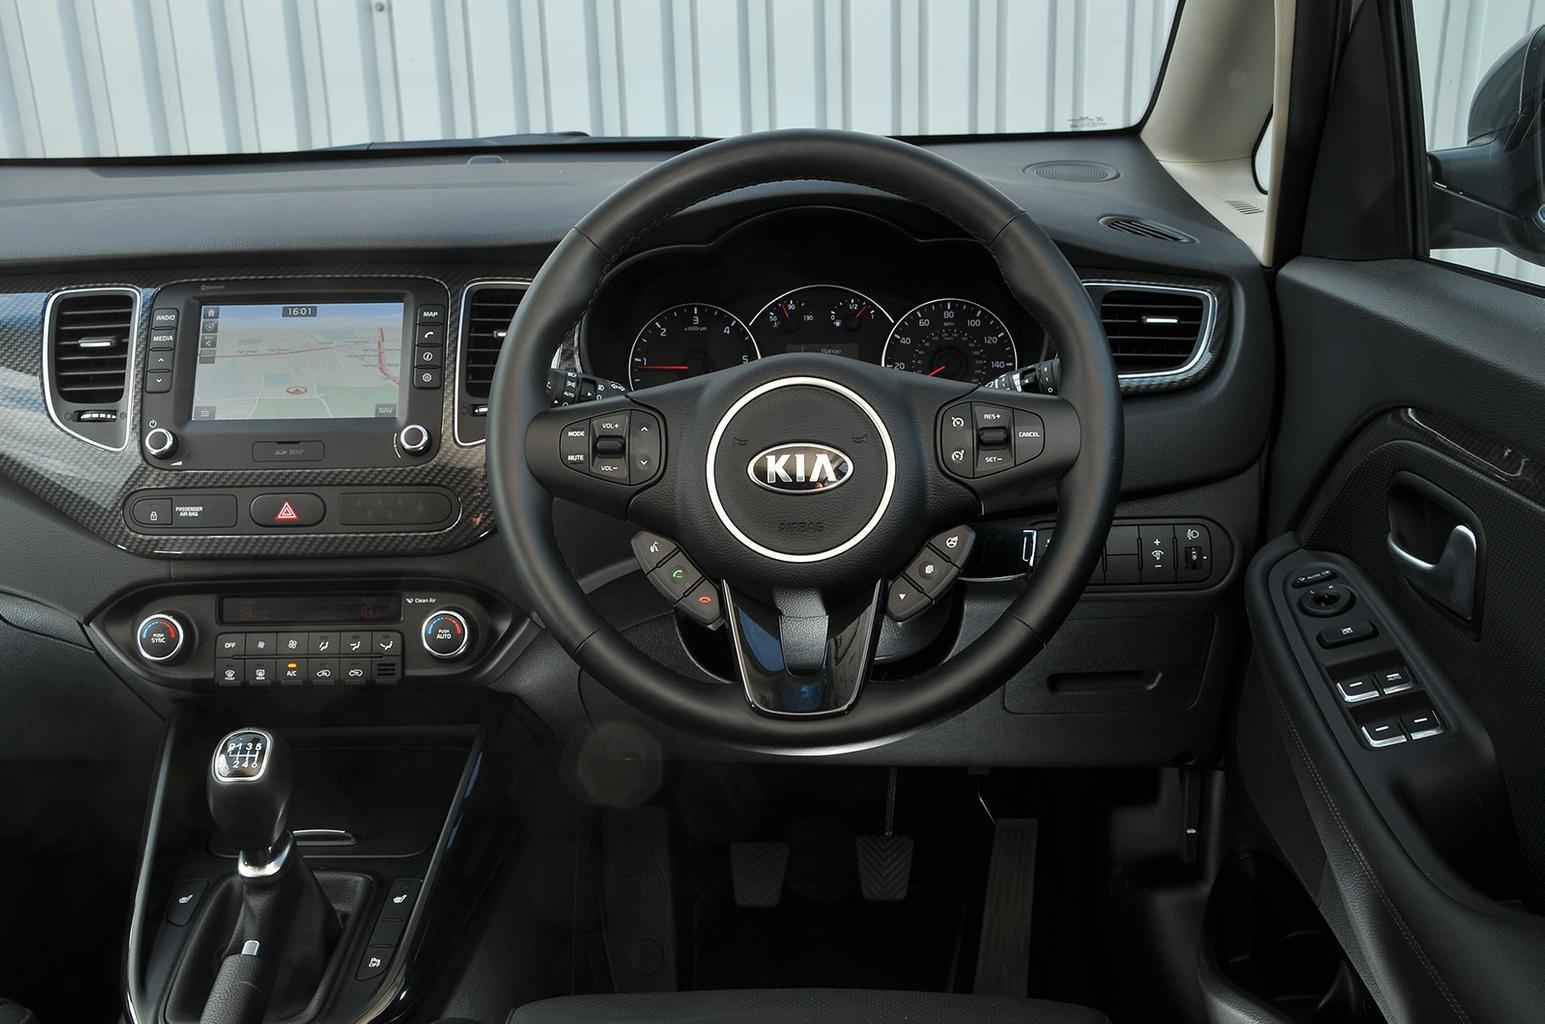 Used Kia Carens 13-present